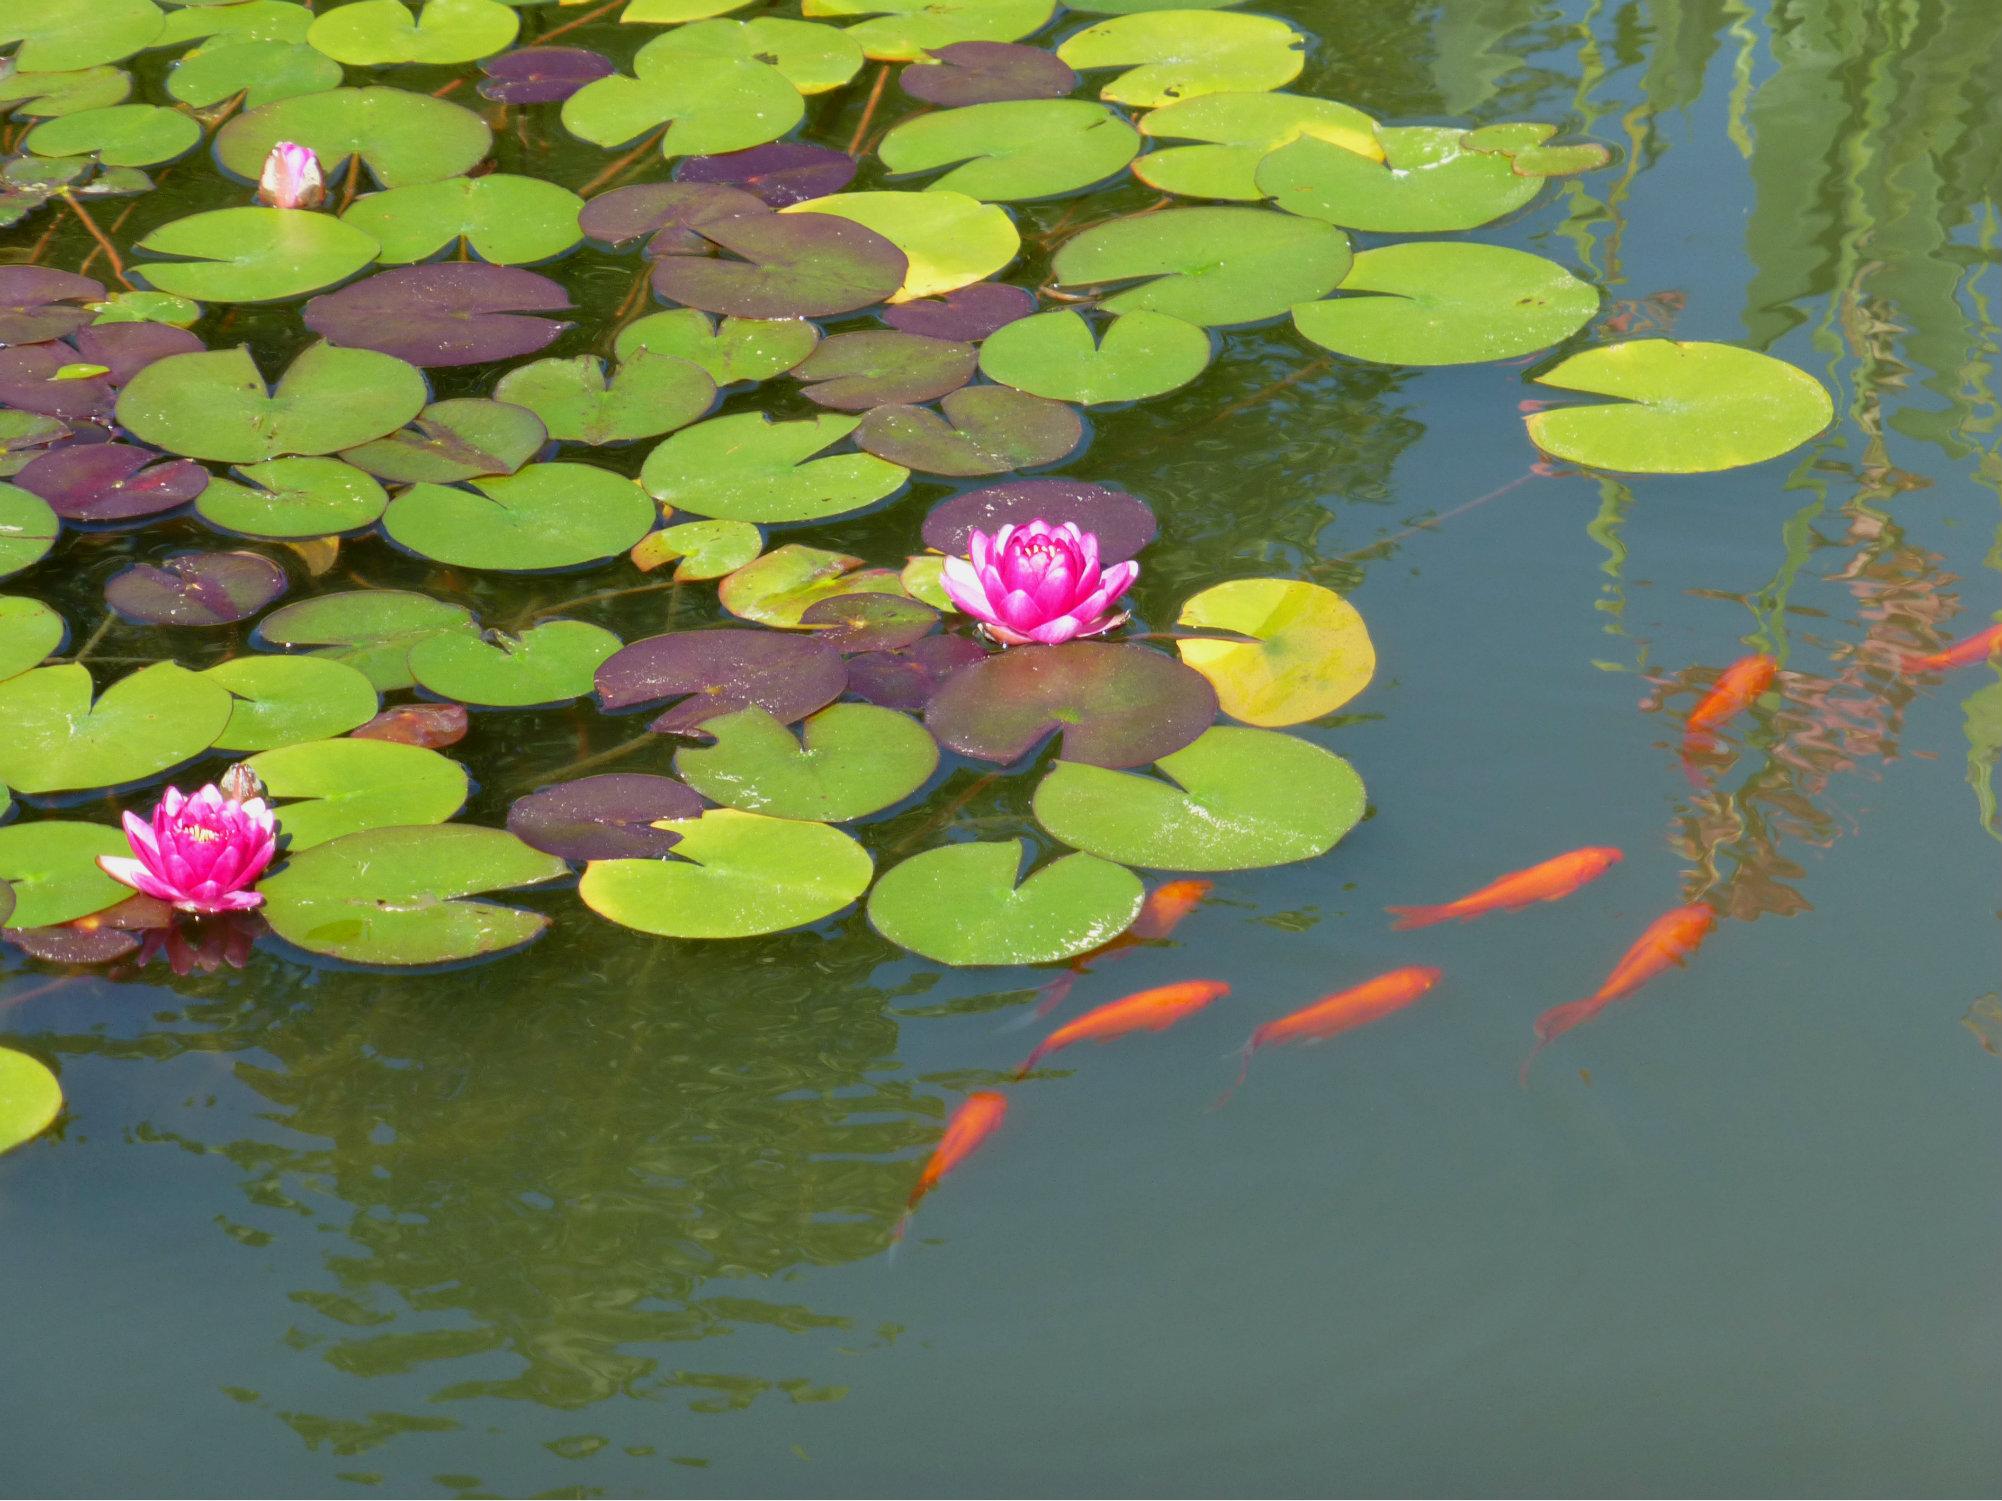 Biltmore Italian Garden Orange Fish and Pink Lilypad Flowers Sept 2012